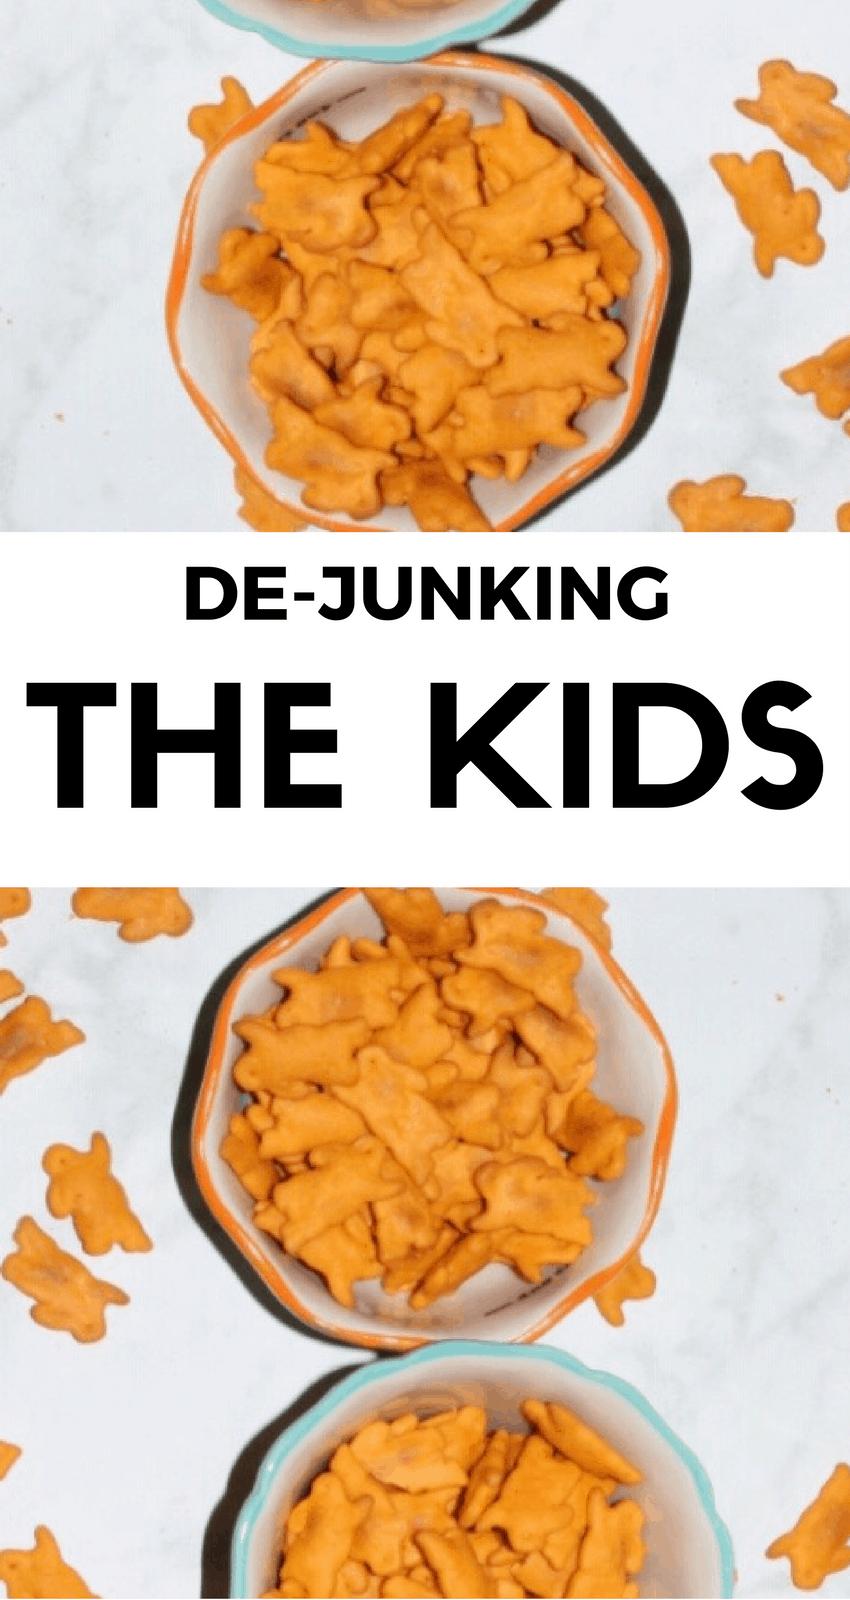 DE-JUNKING